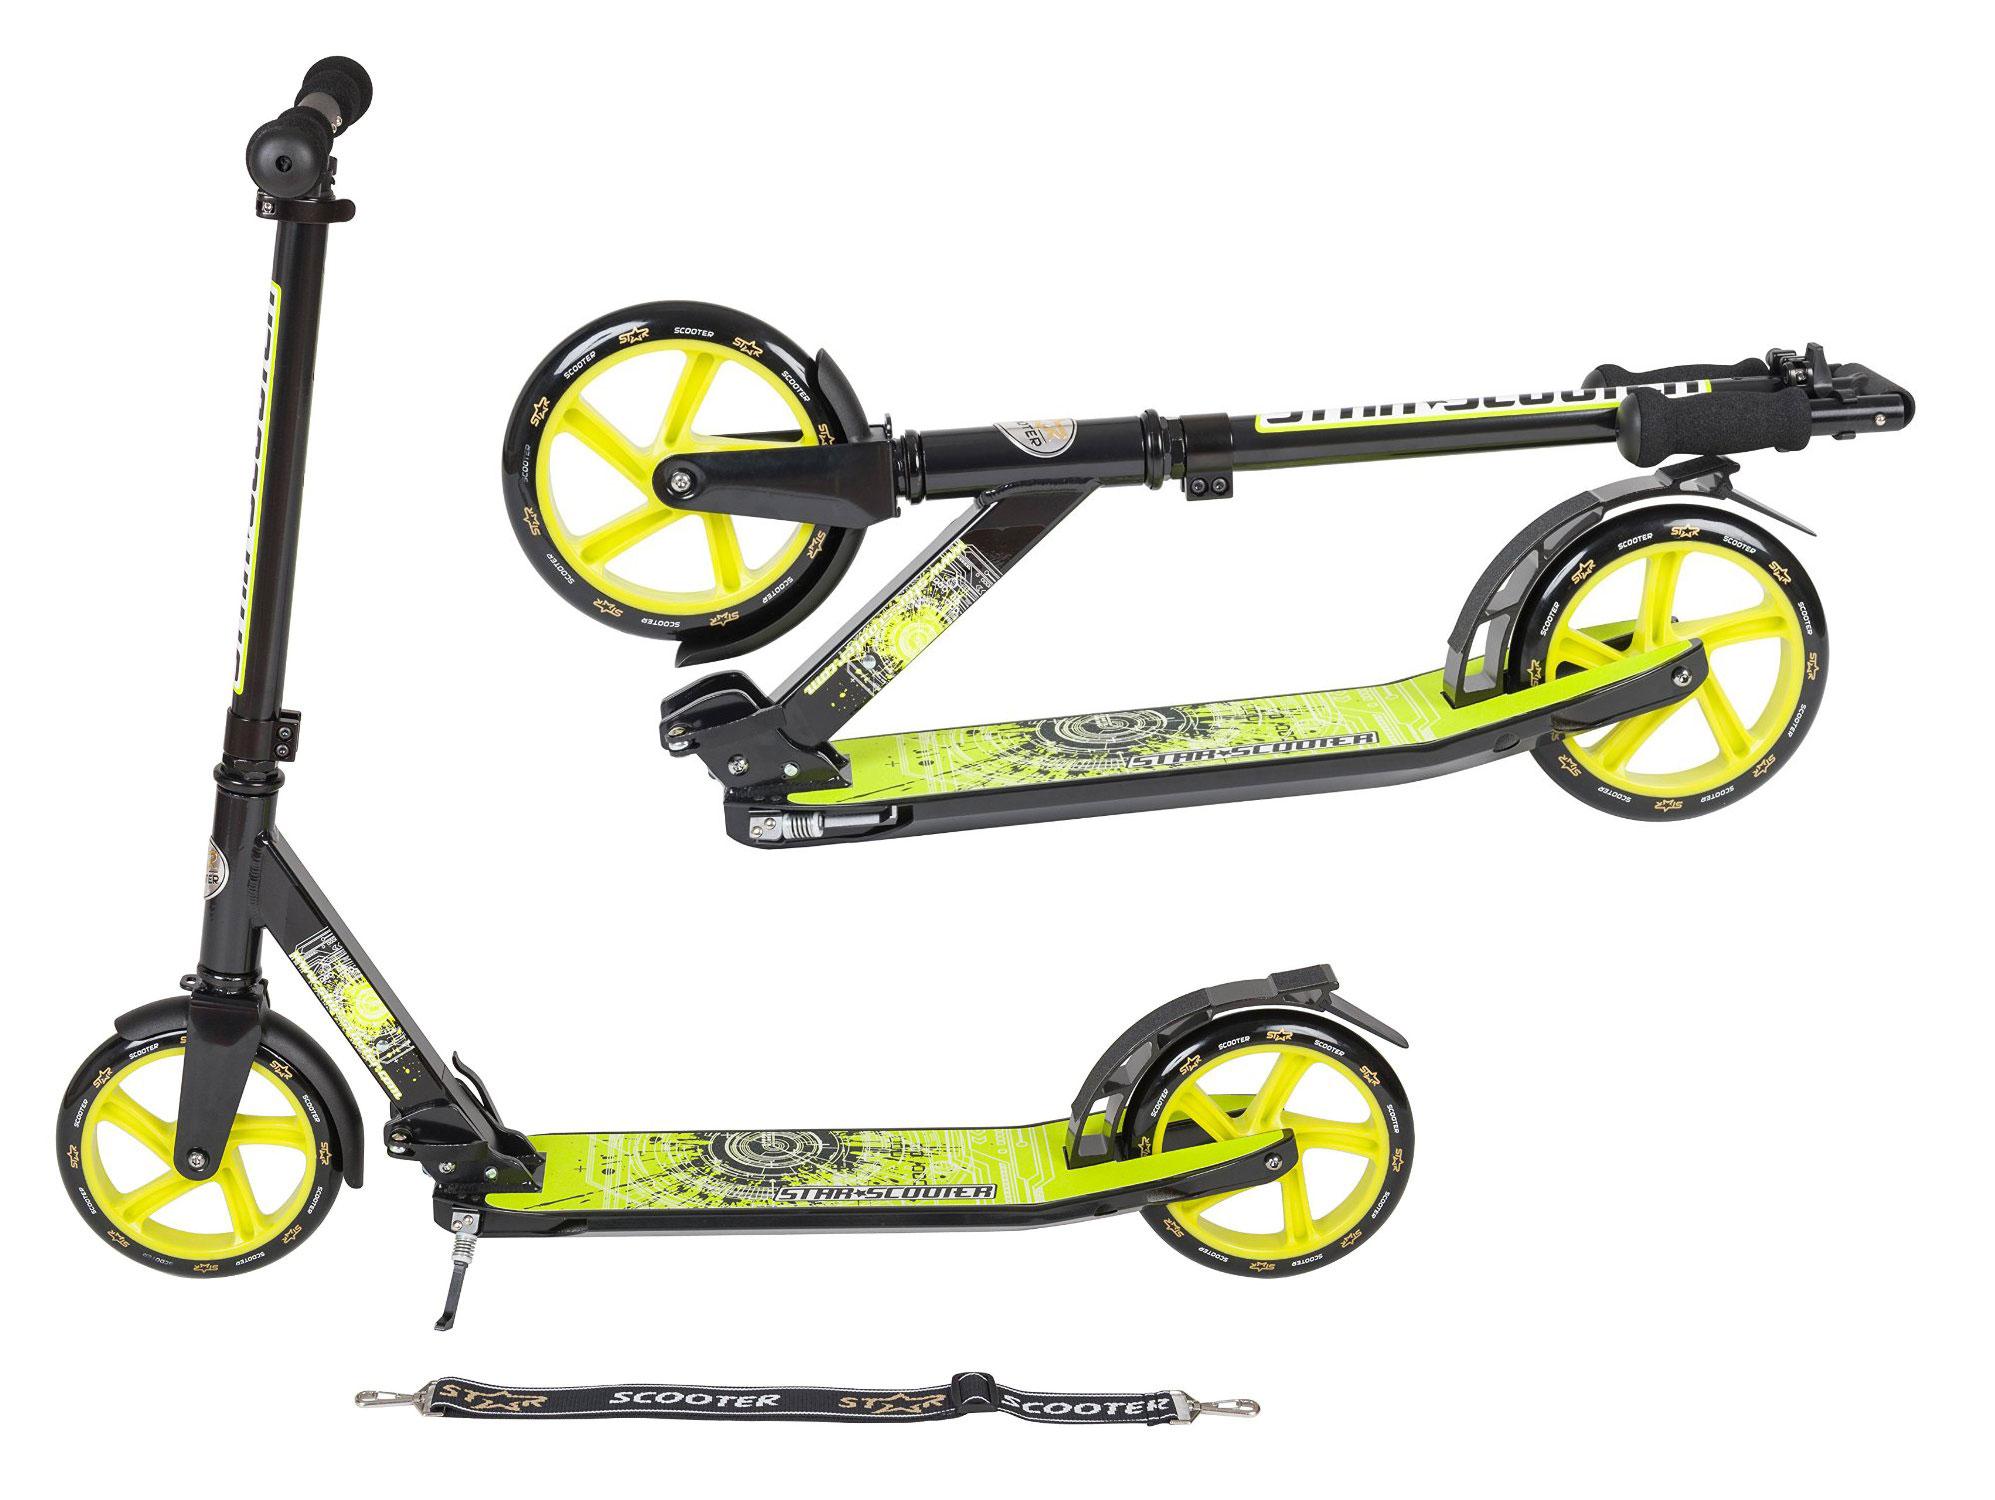 SKÚTER BikeStar 205mm100kg NEMECKÝ čistý luxus XL